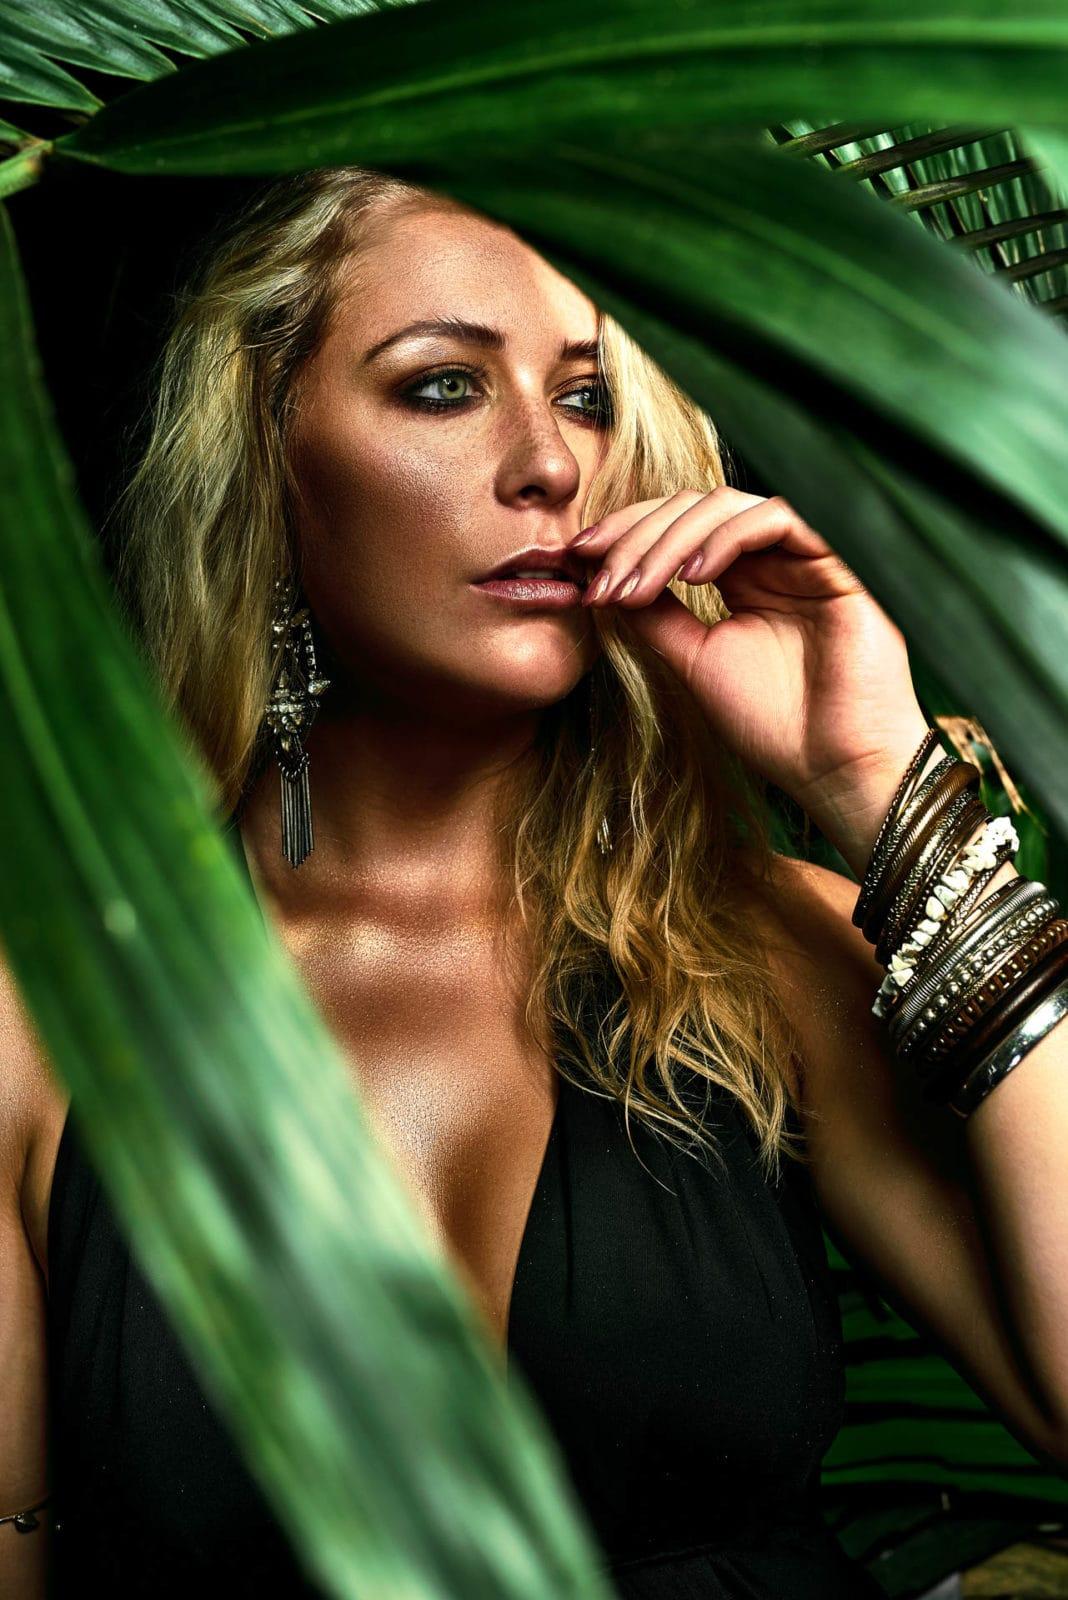 Aufwendige Beauty Photography mit professioneller Postproduction und Beauty Retouching